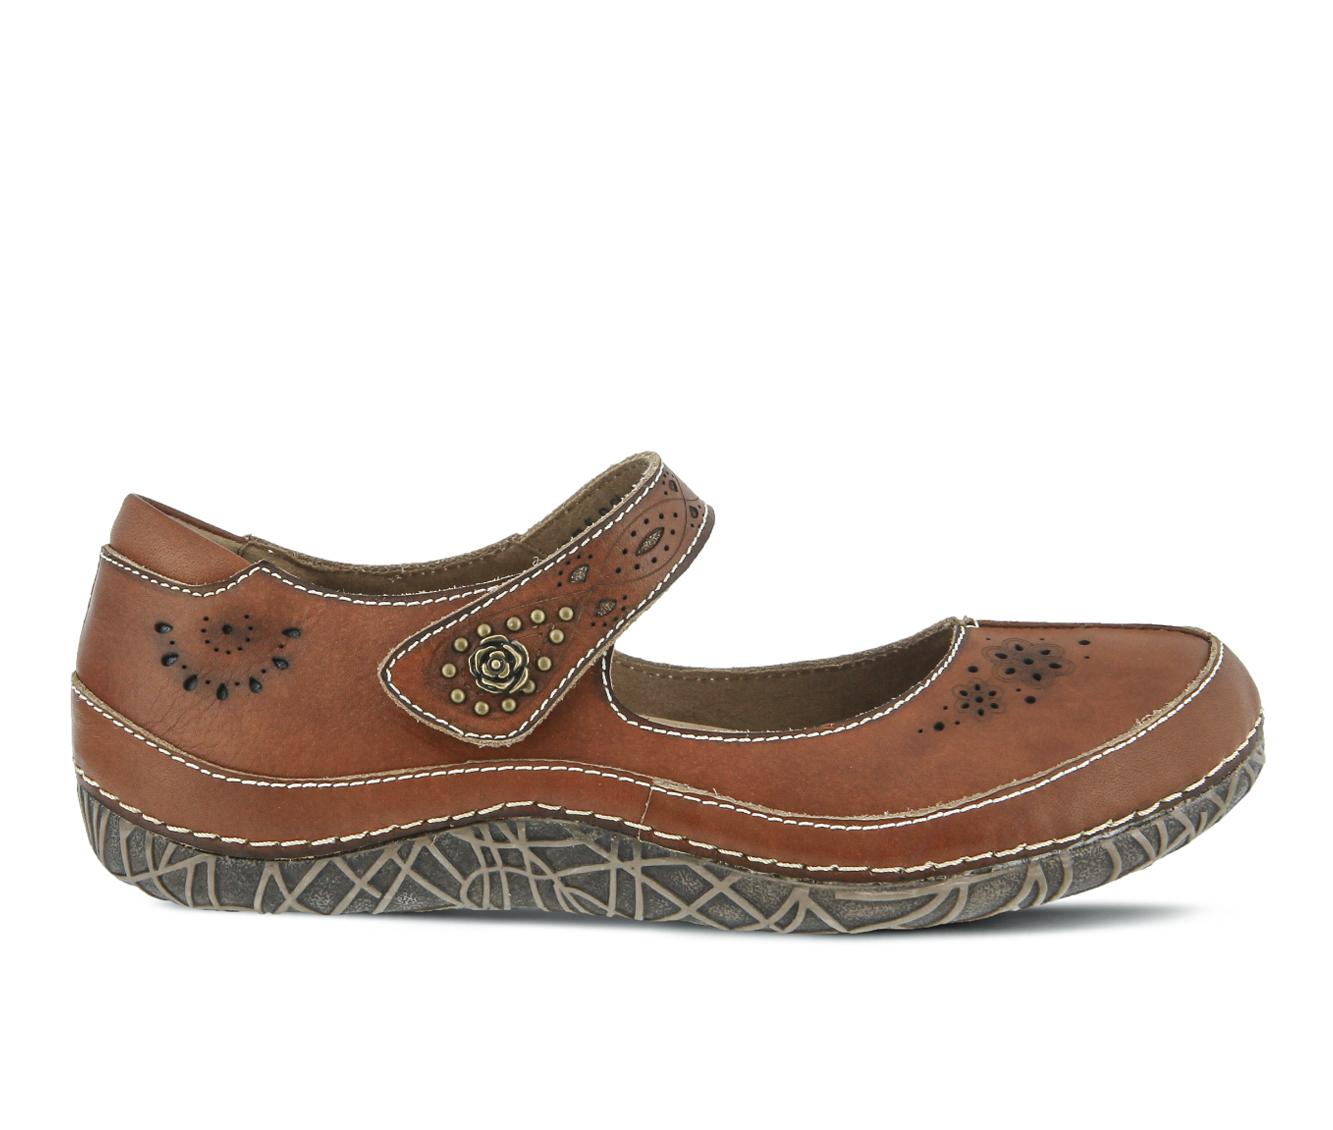 L'Artiste Lazarina Women's Shoe (Brown Leather)